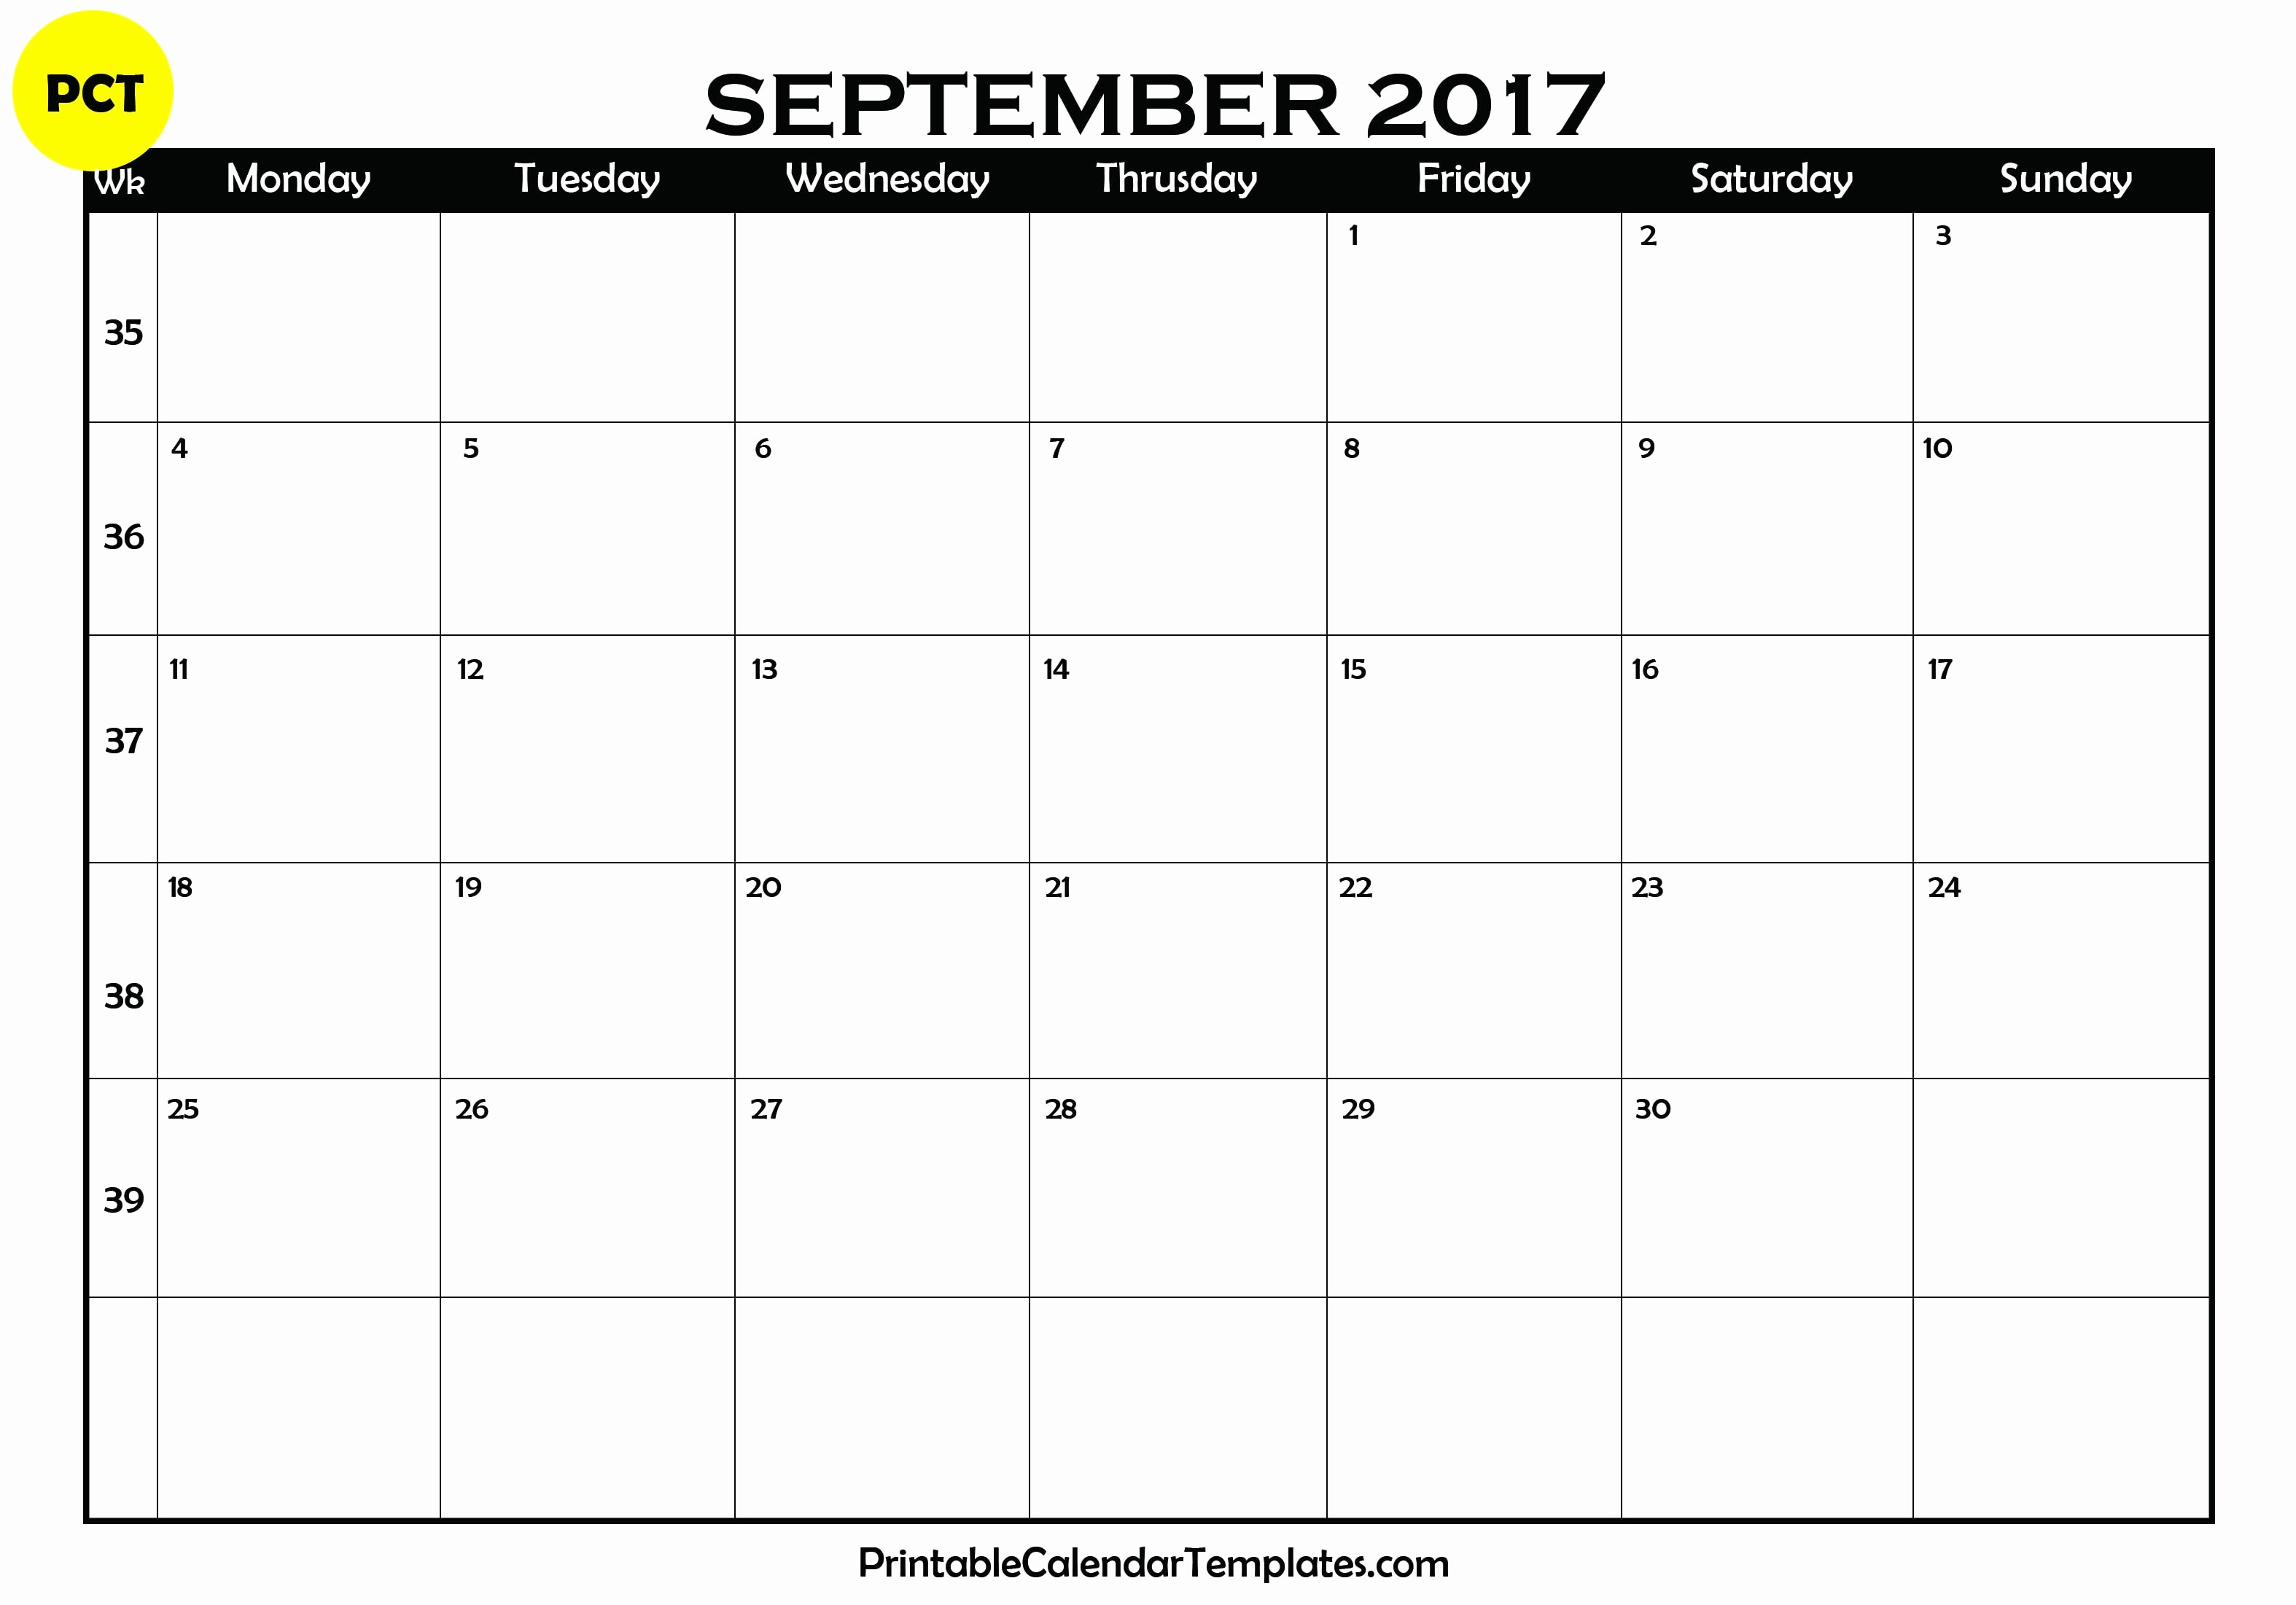 Free Blank Printable Calendar 2017 Luxury September 2017 Printable Calendar